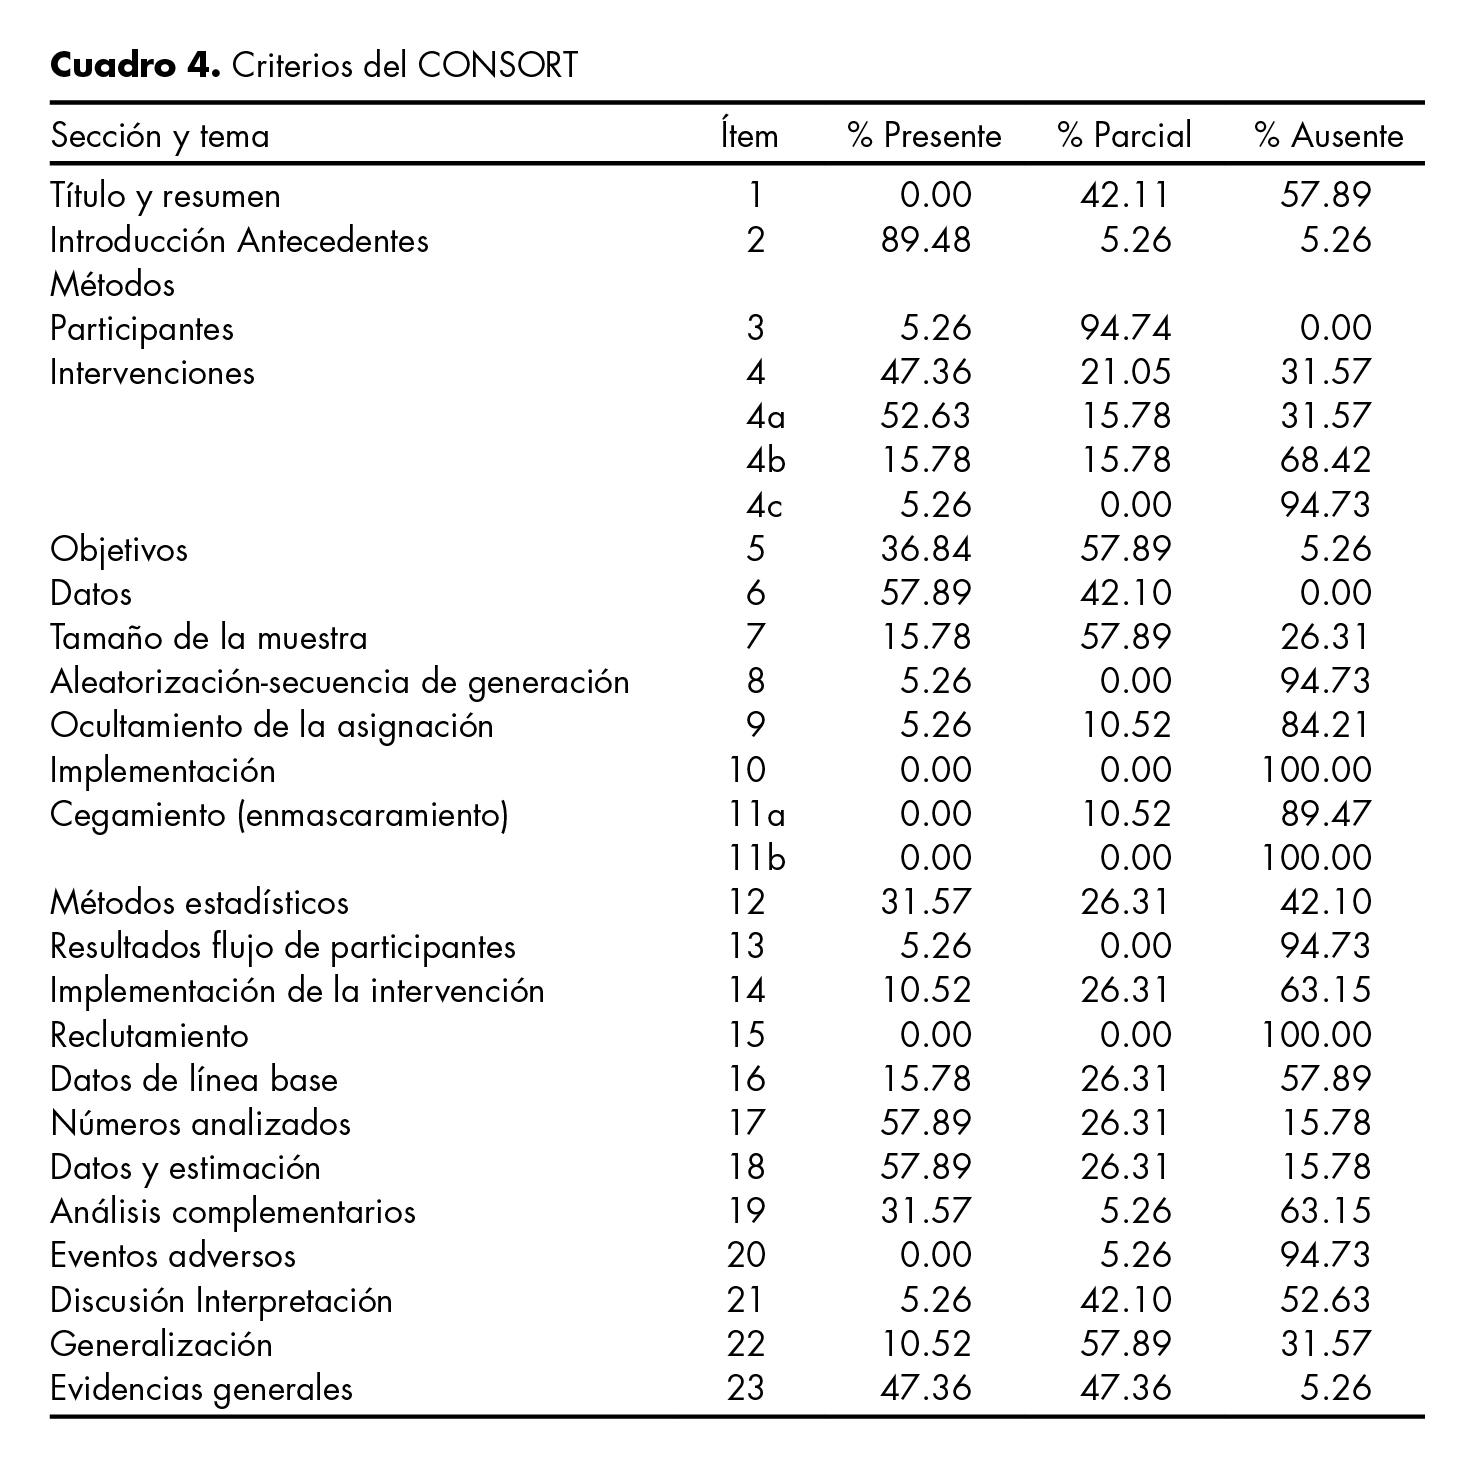 Criterios del CONSORT